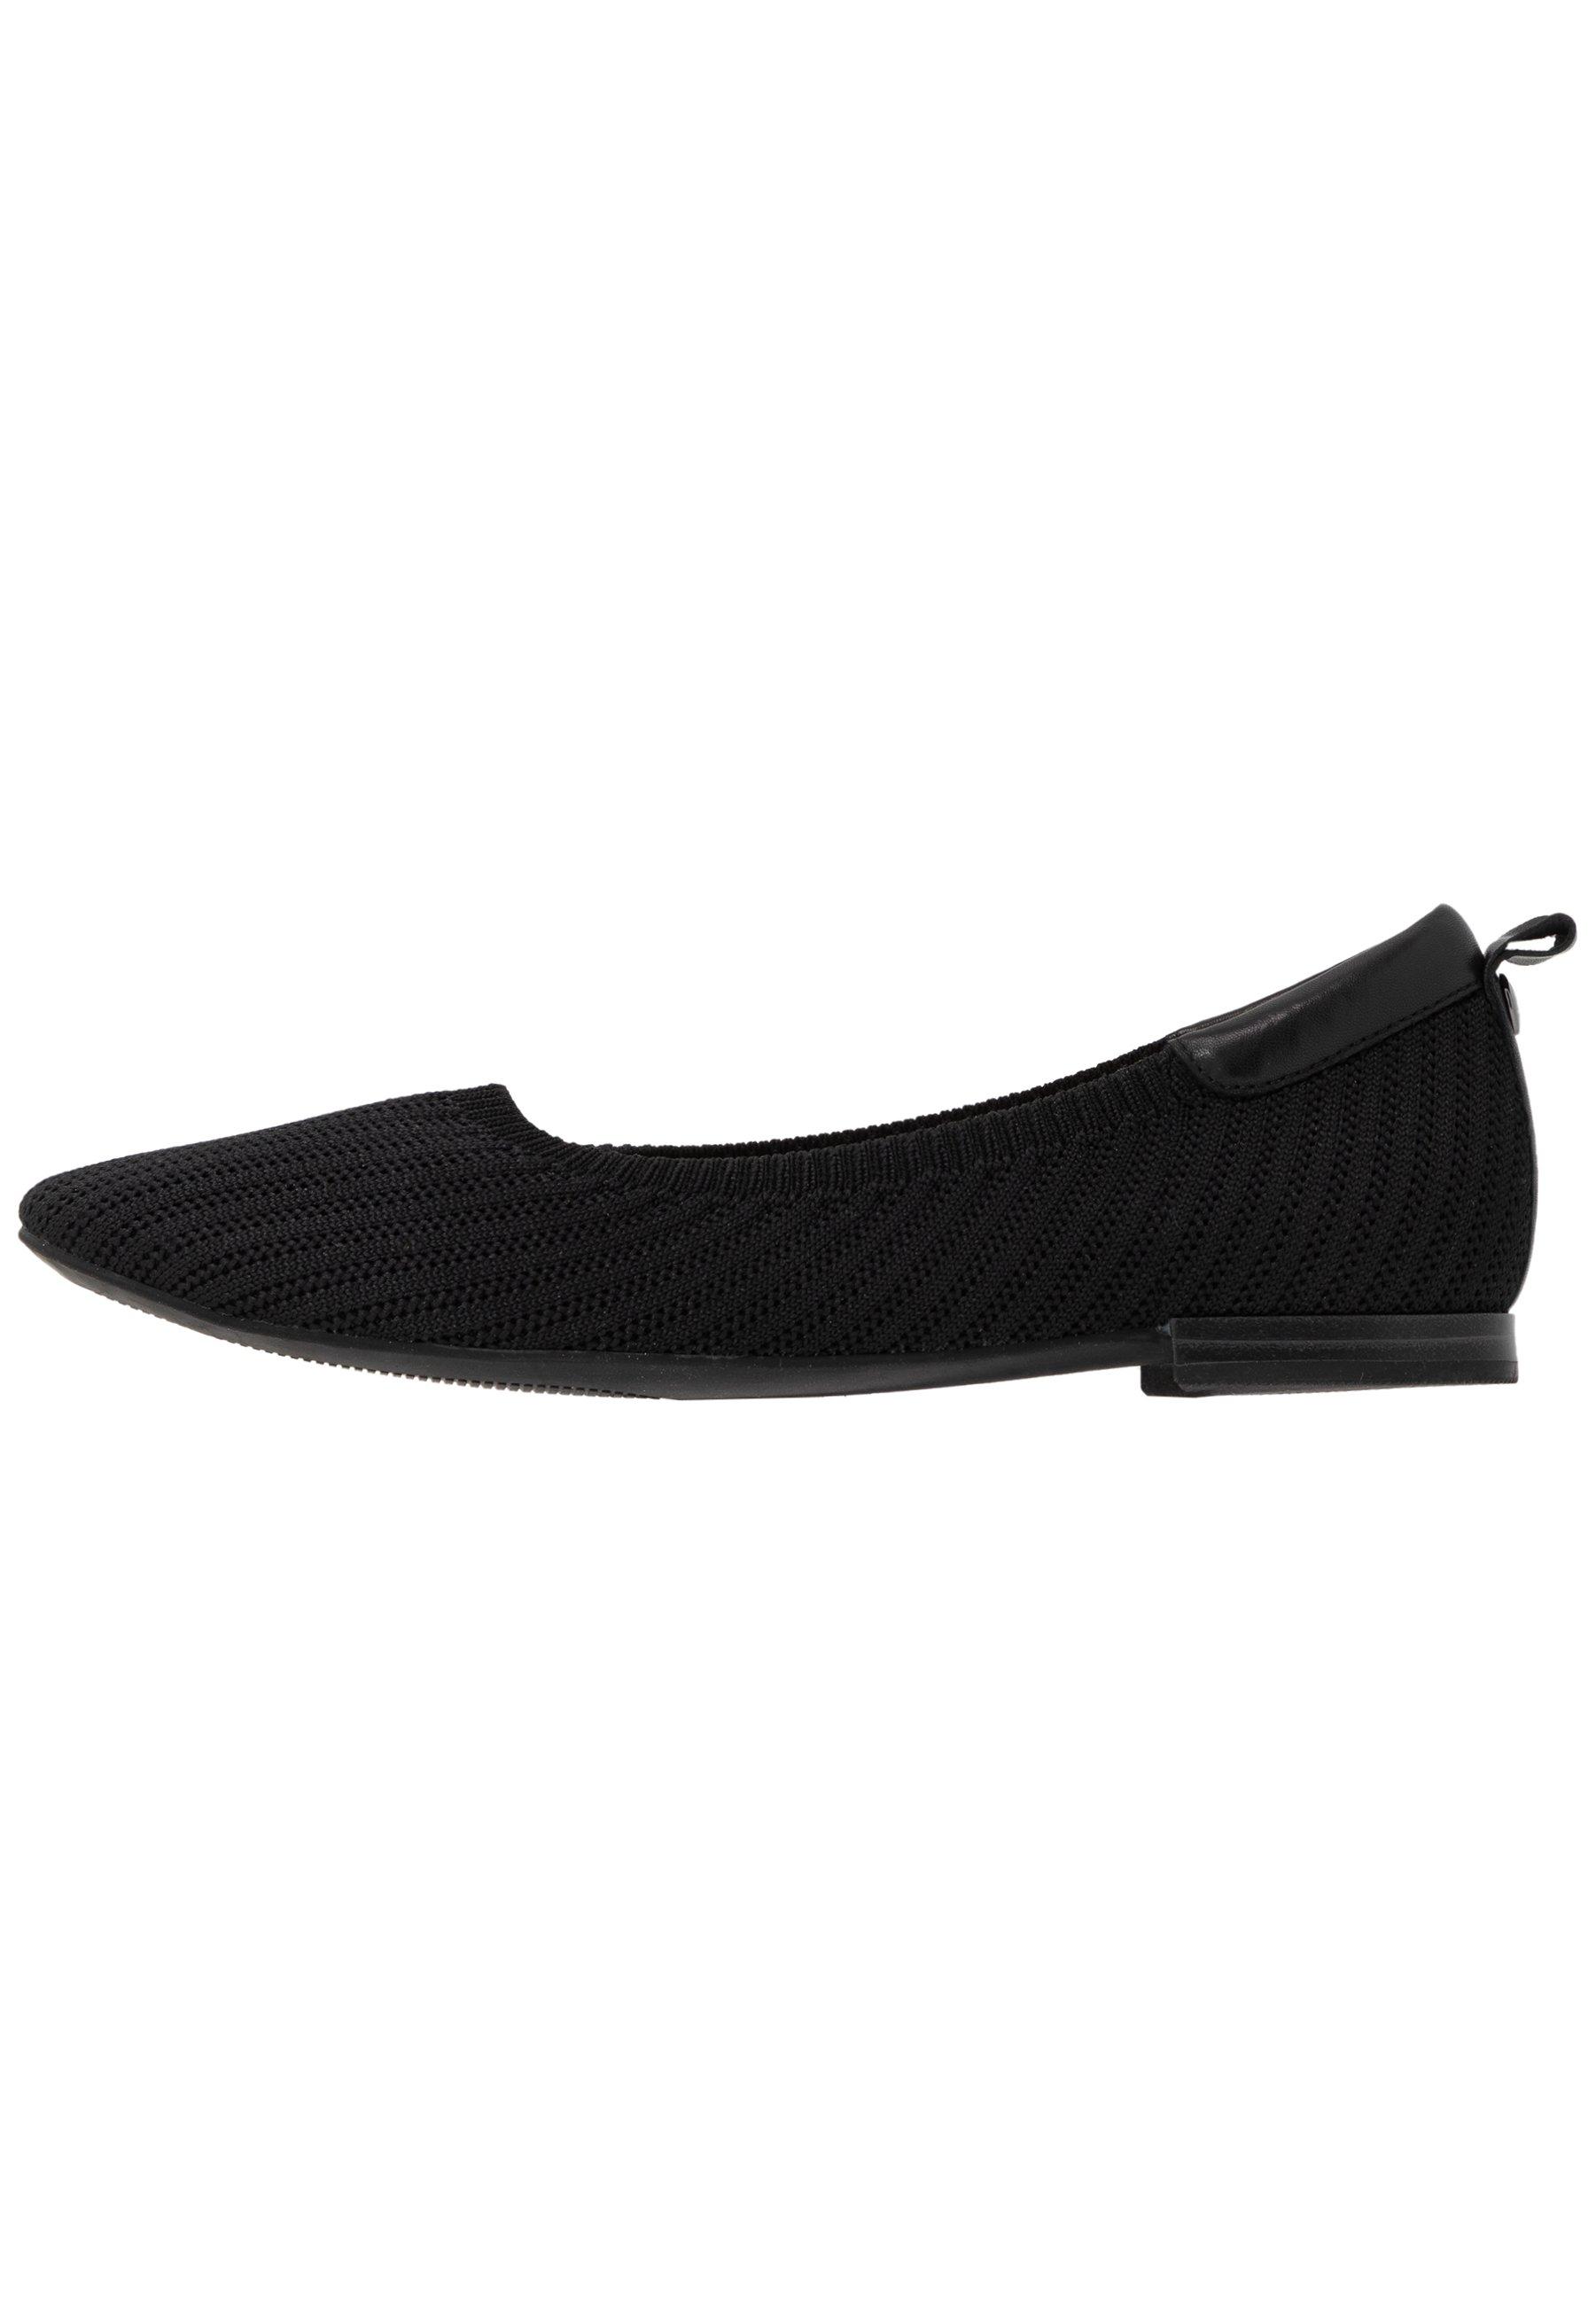 Caprice Ballerina - Black/svart